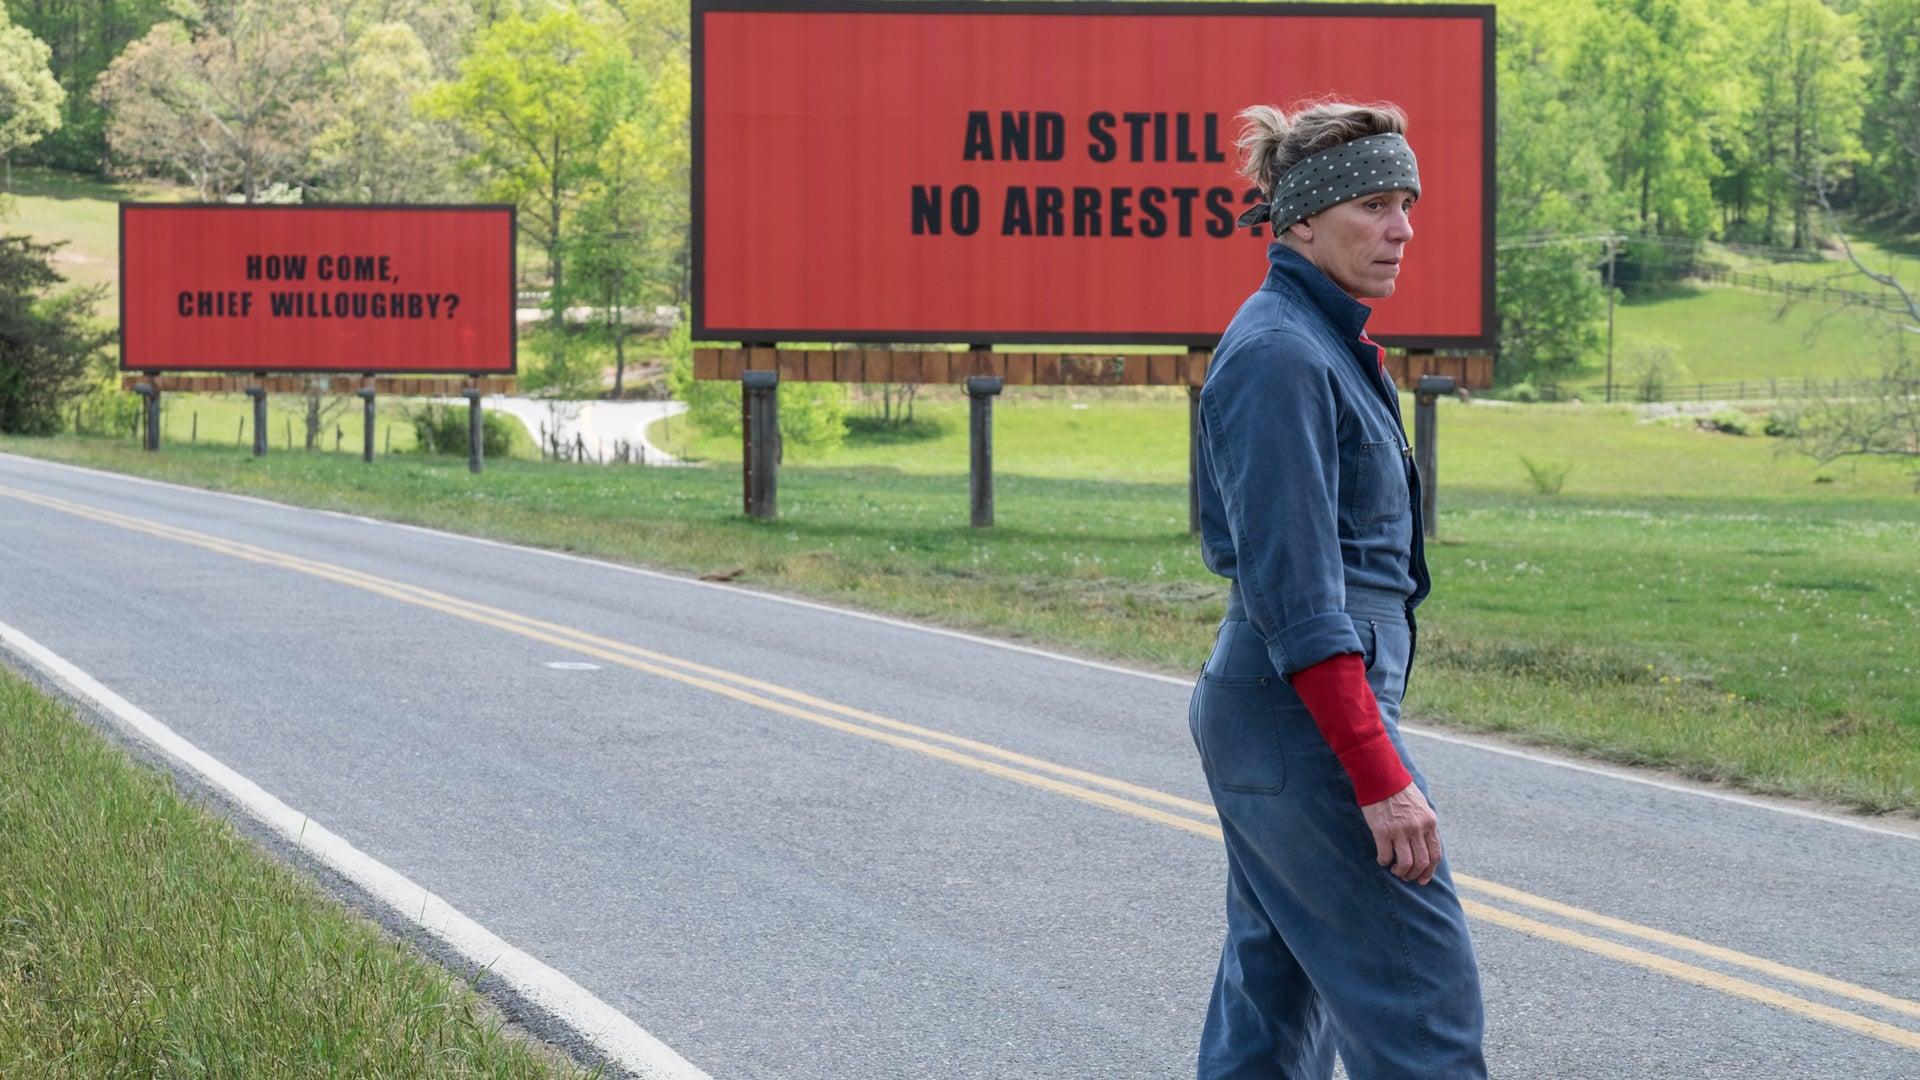 Frances McDormand, Three Billboards Outside Ebbing, Missouri